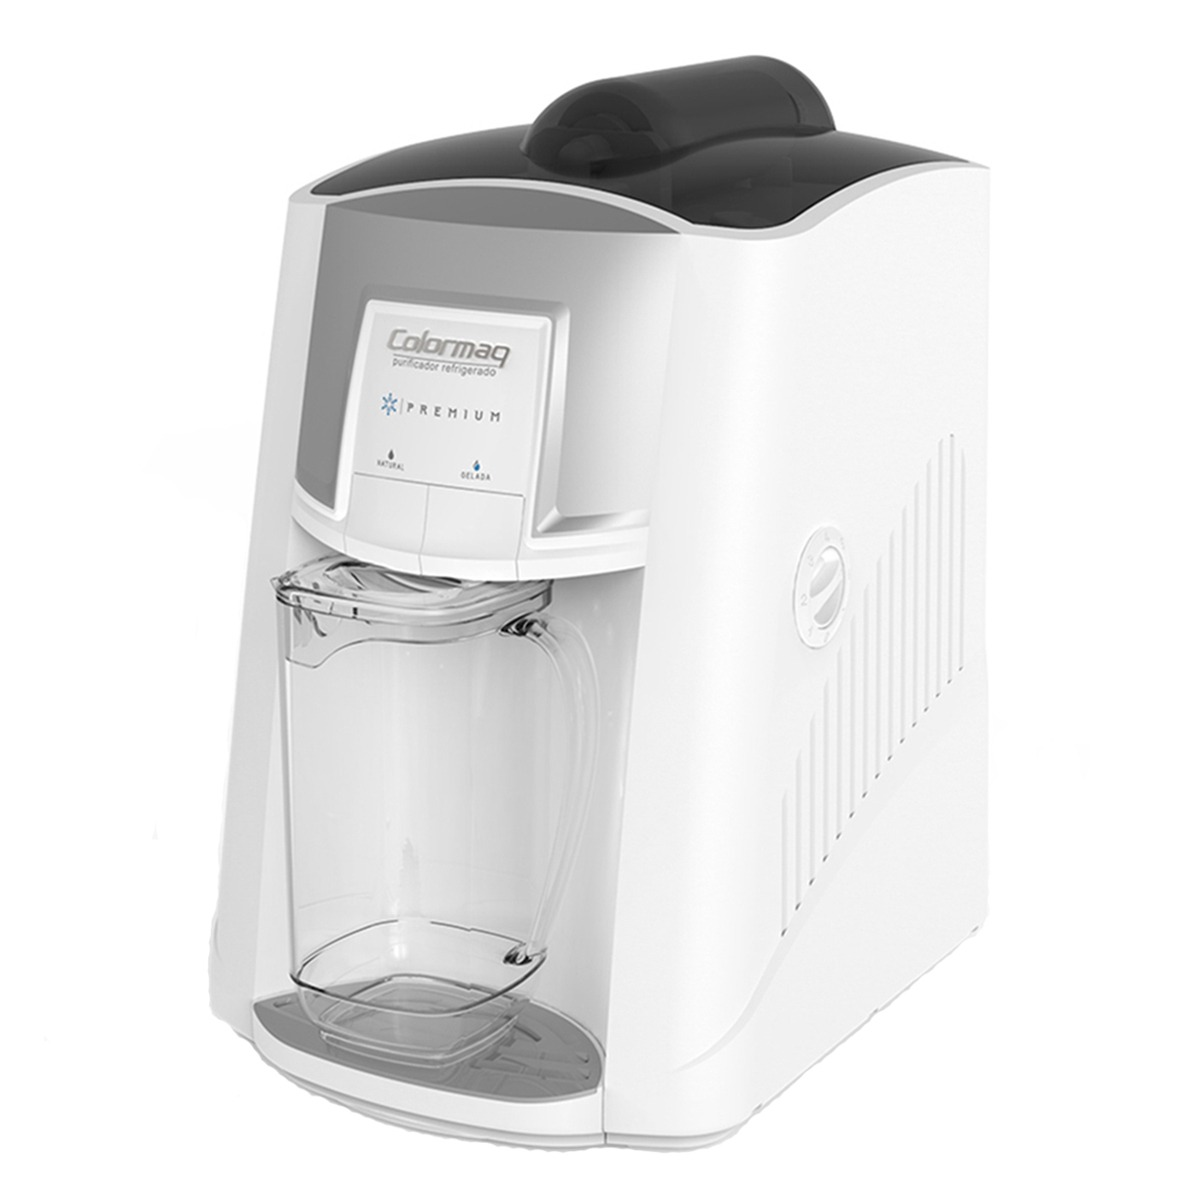 Purificador de Água Colormaq Premium Branco CPUHFBB1 BC 220V